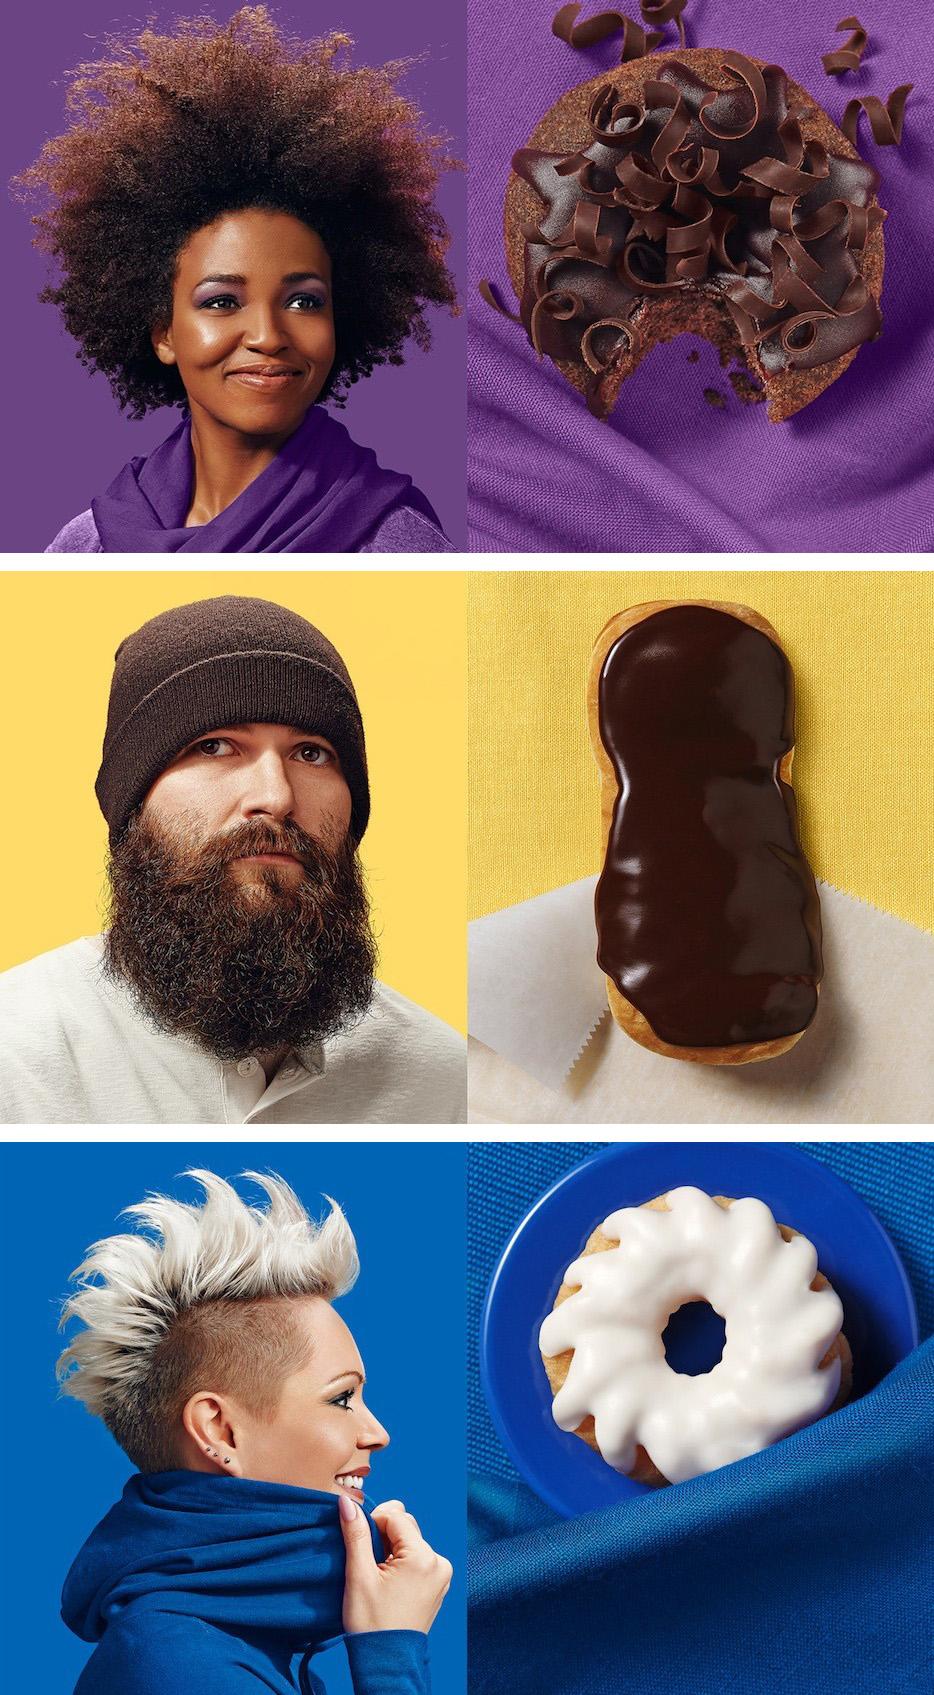 Brandon Voges x Strange Donut collaborate on Donut Doubles, a delicious portrait series | www.alicia-carvalho.com/blog